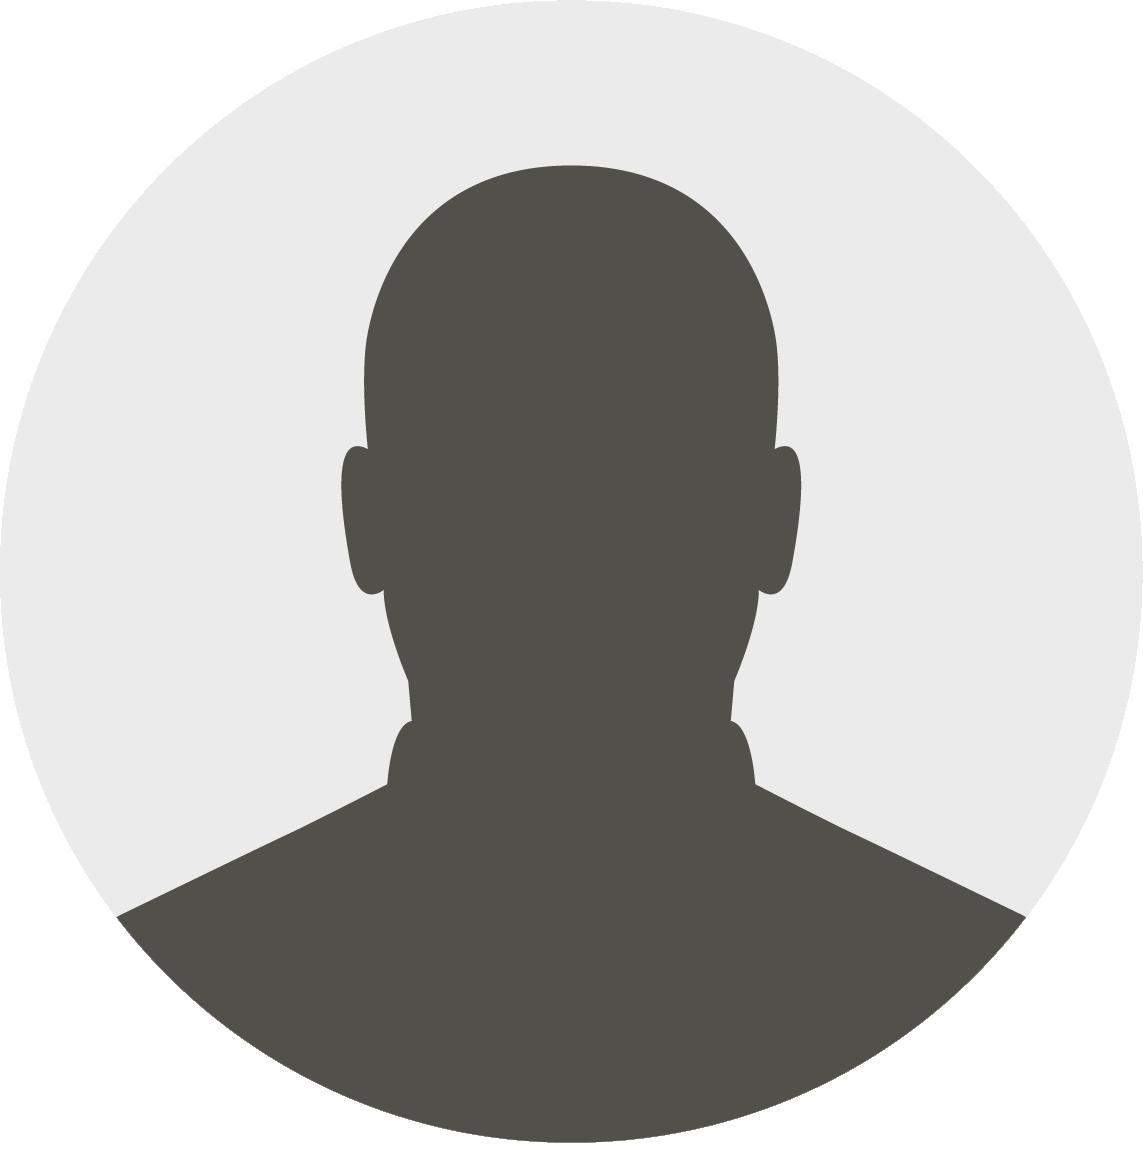 Christopher Ngobi